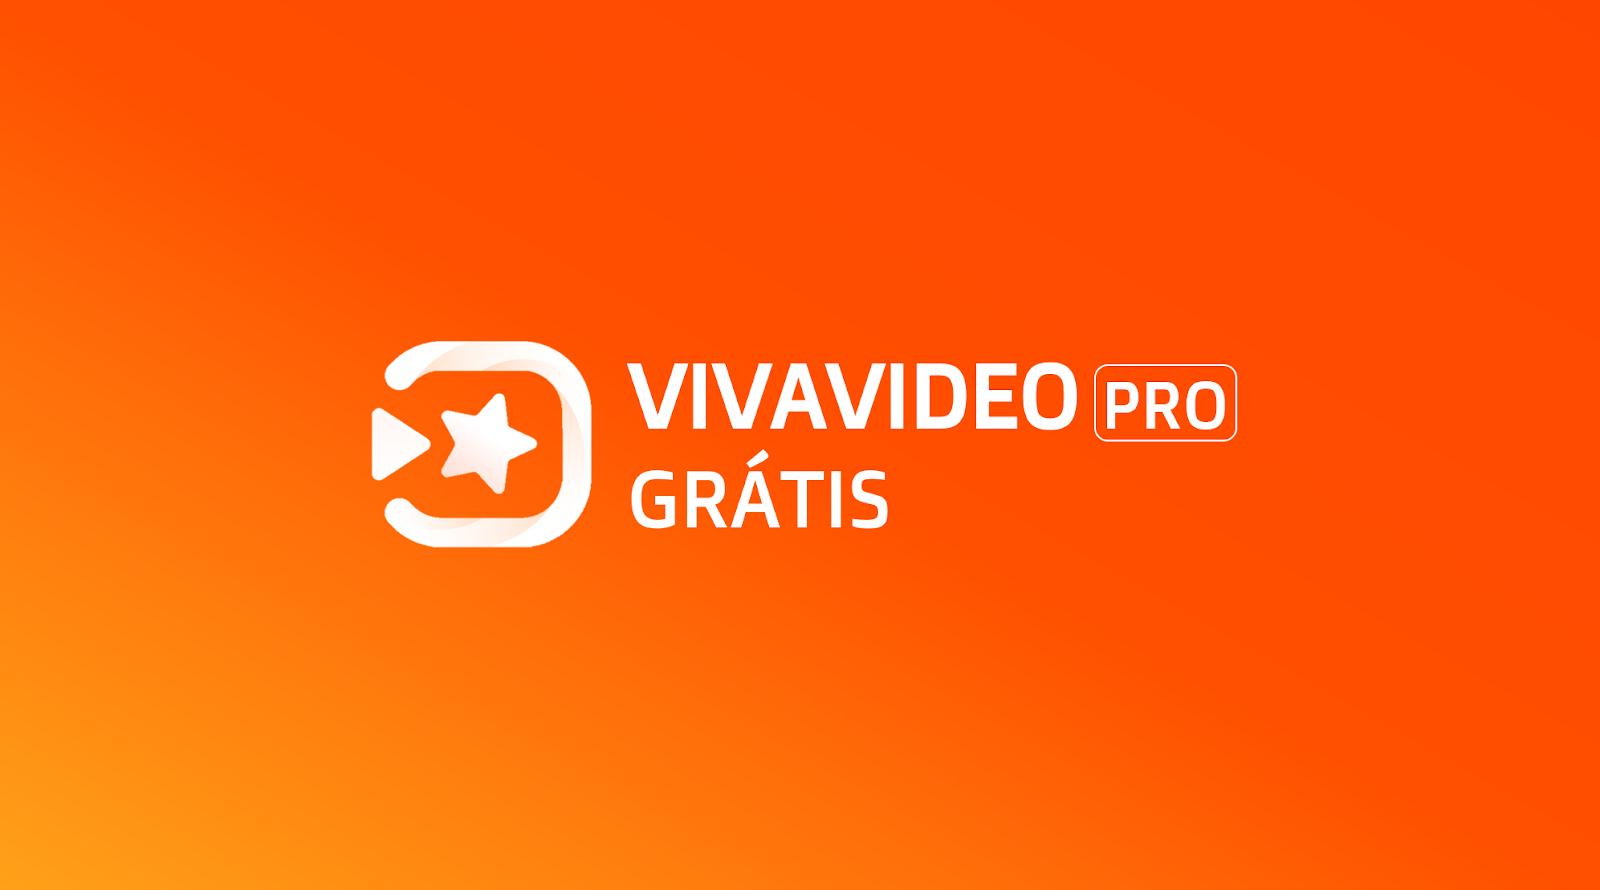 Viva Video PRO ! BAIXAR E INSTALAR GRÁTIS